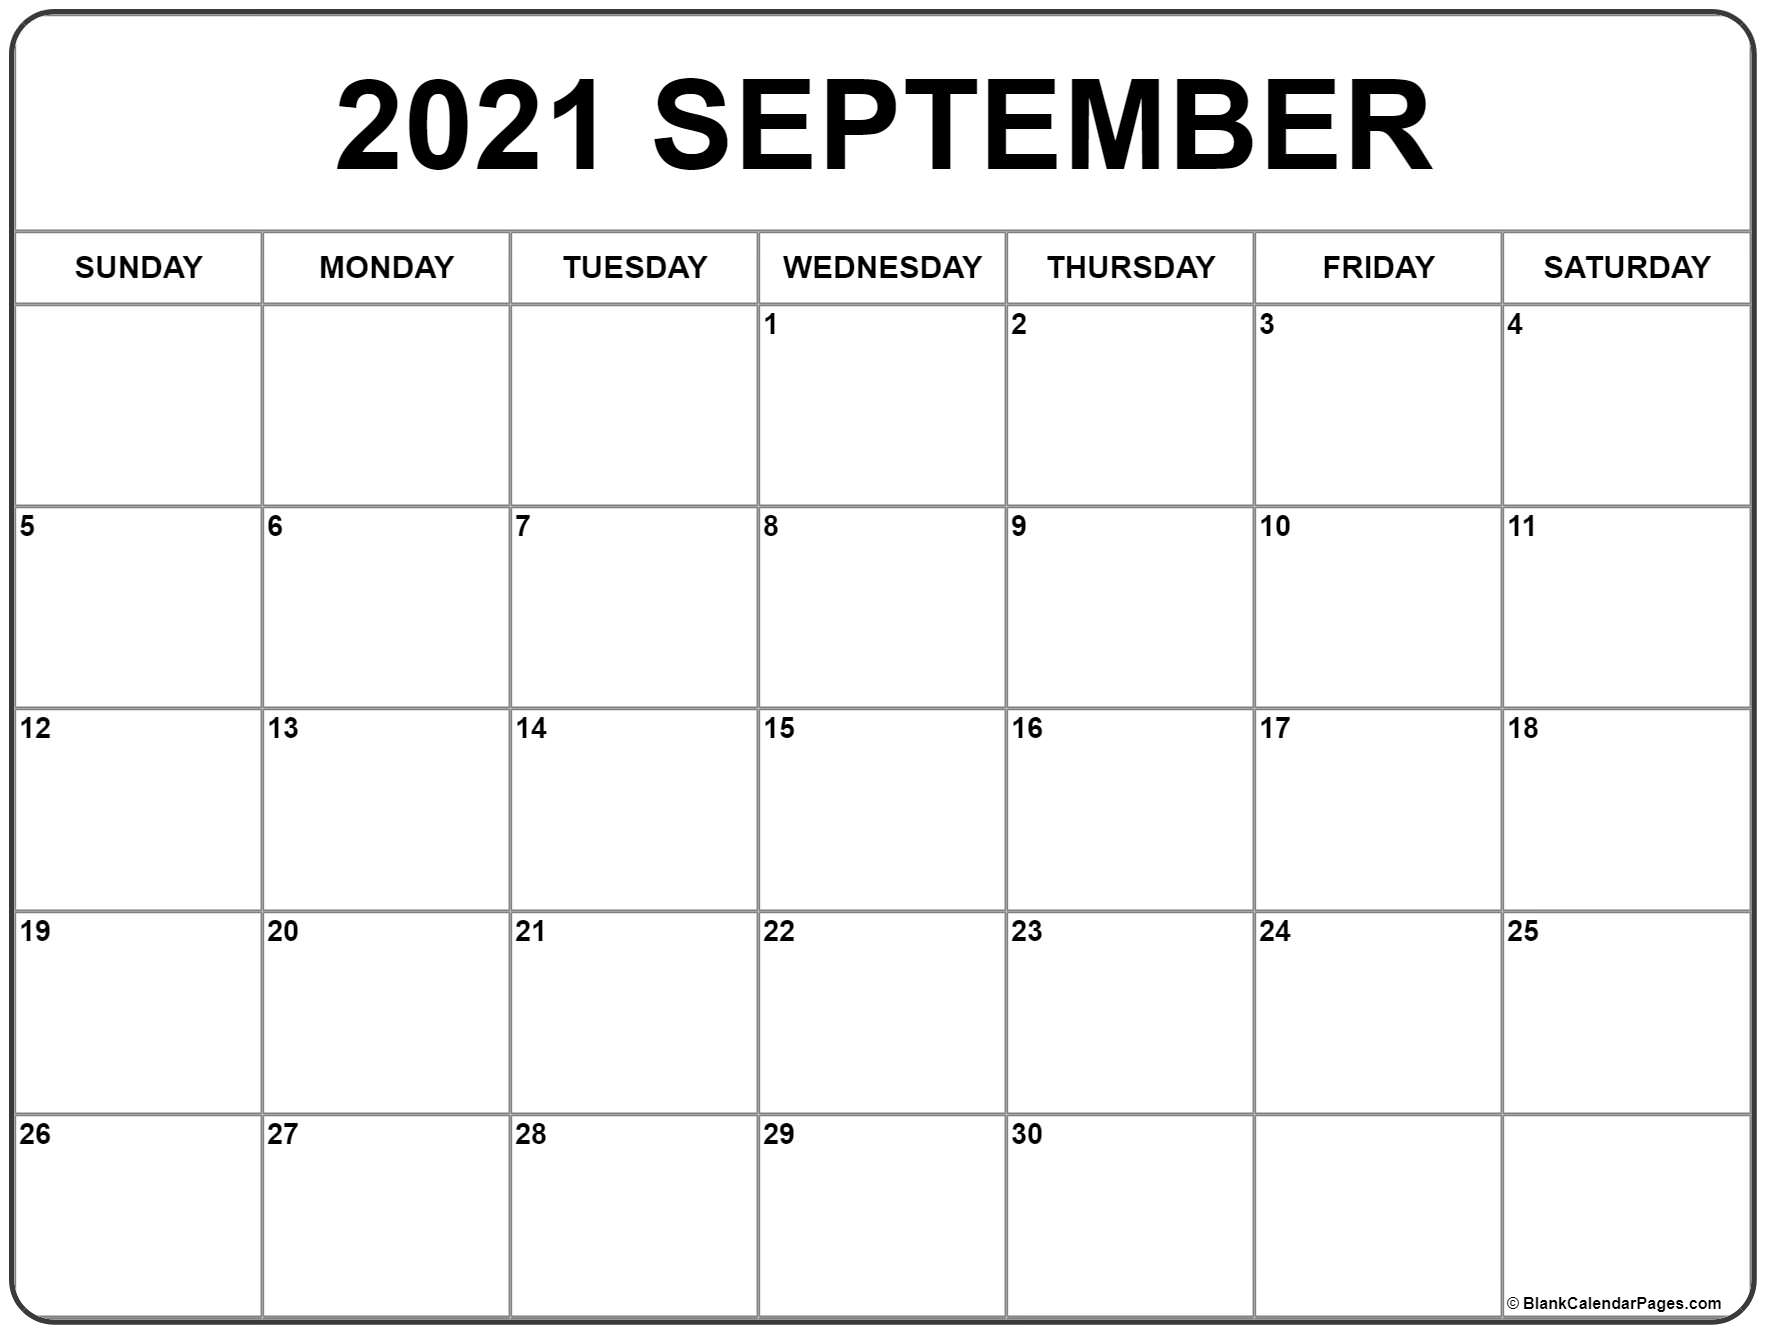 Collect 2021 Free Printable September Calendar